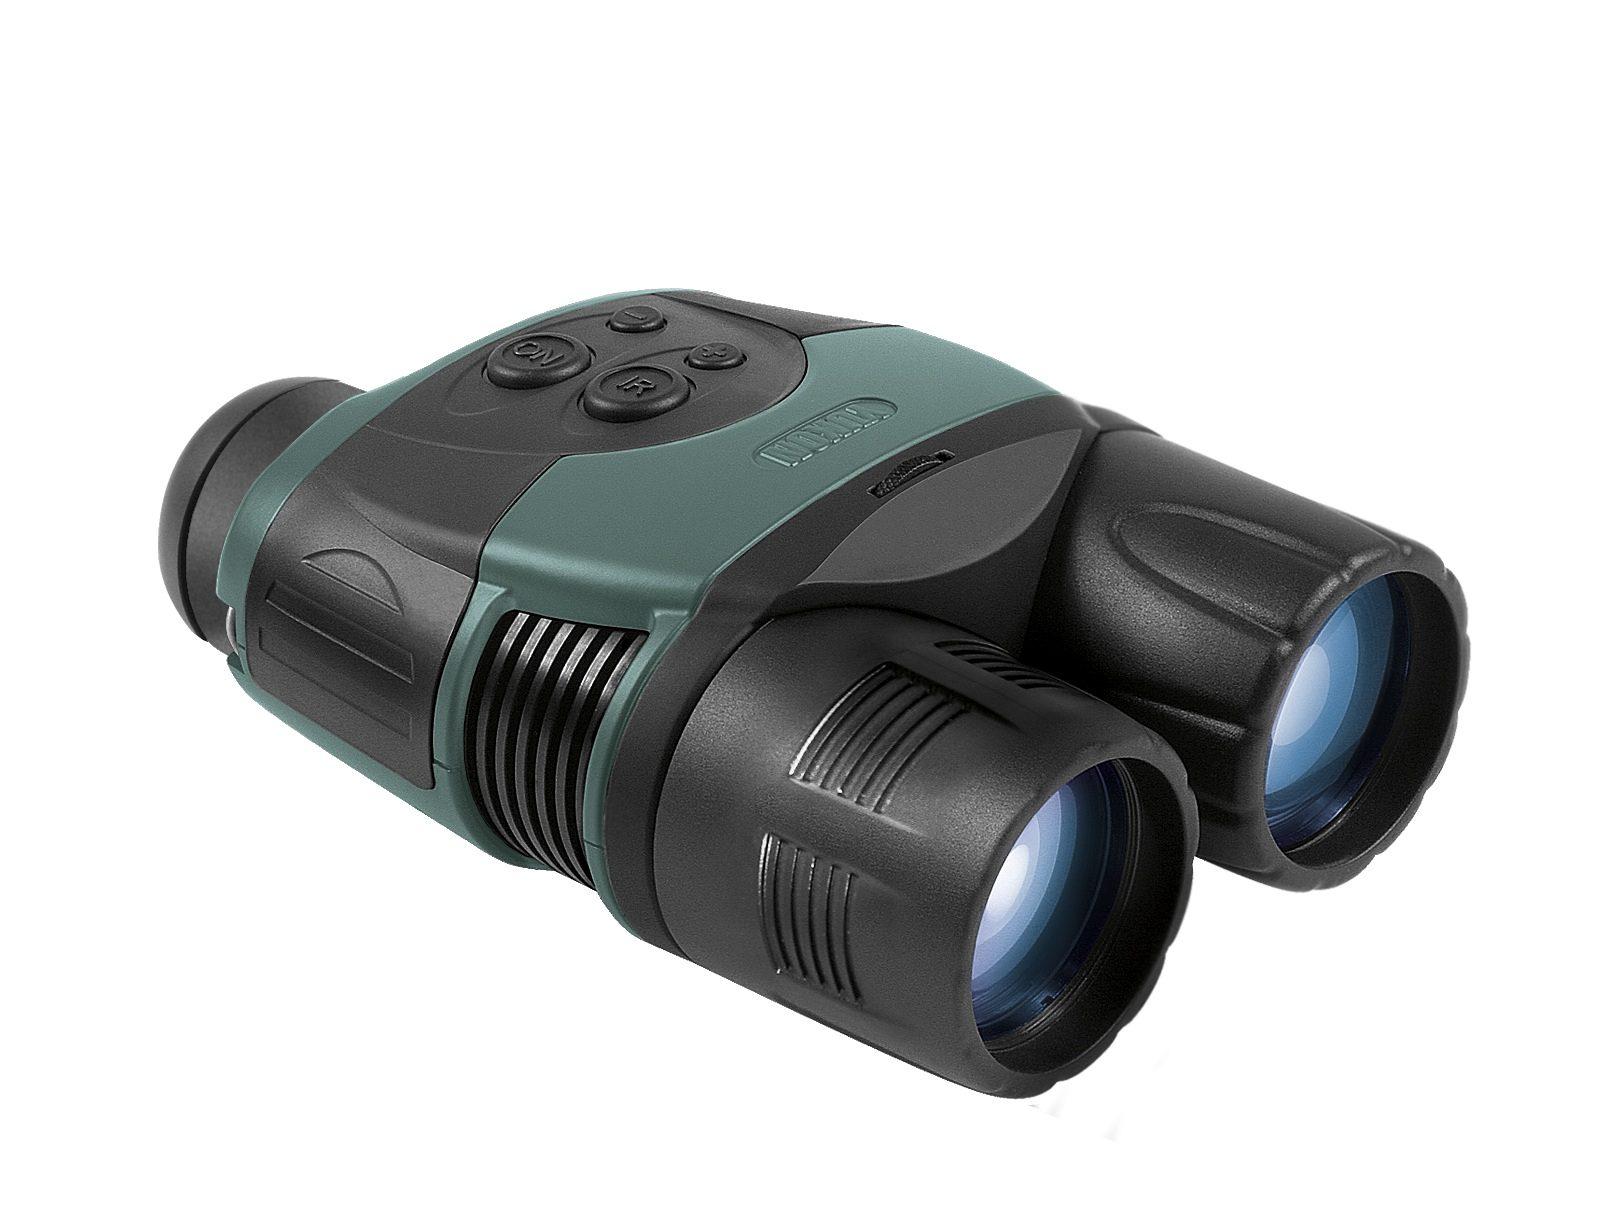 BRESSER Nachtsichtgerät »YUKON Ranger LT 6.5x42 Digitales Nachtsichtgerät -«